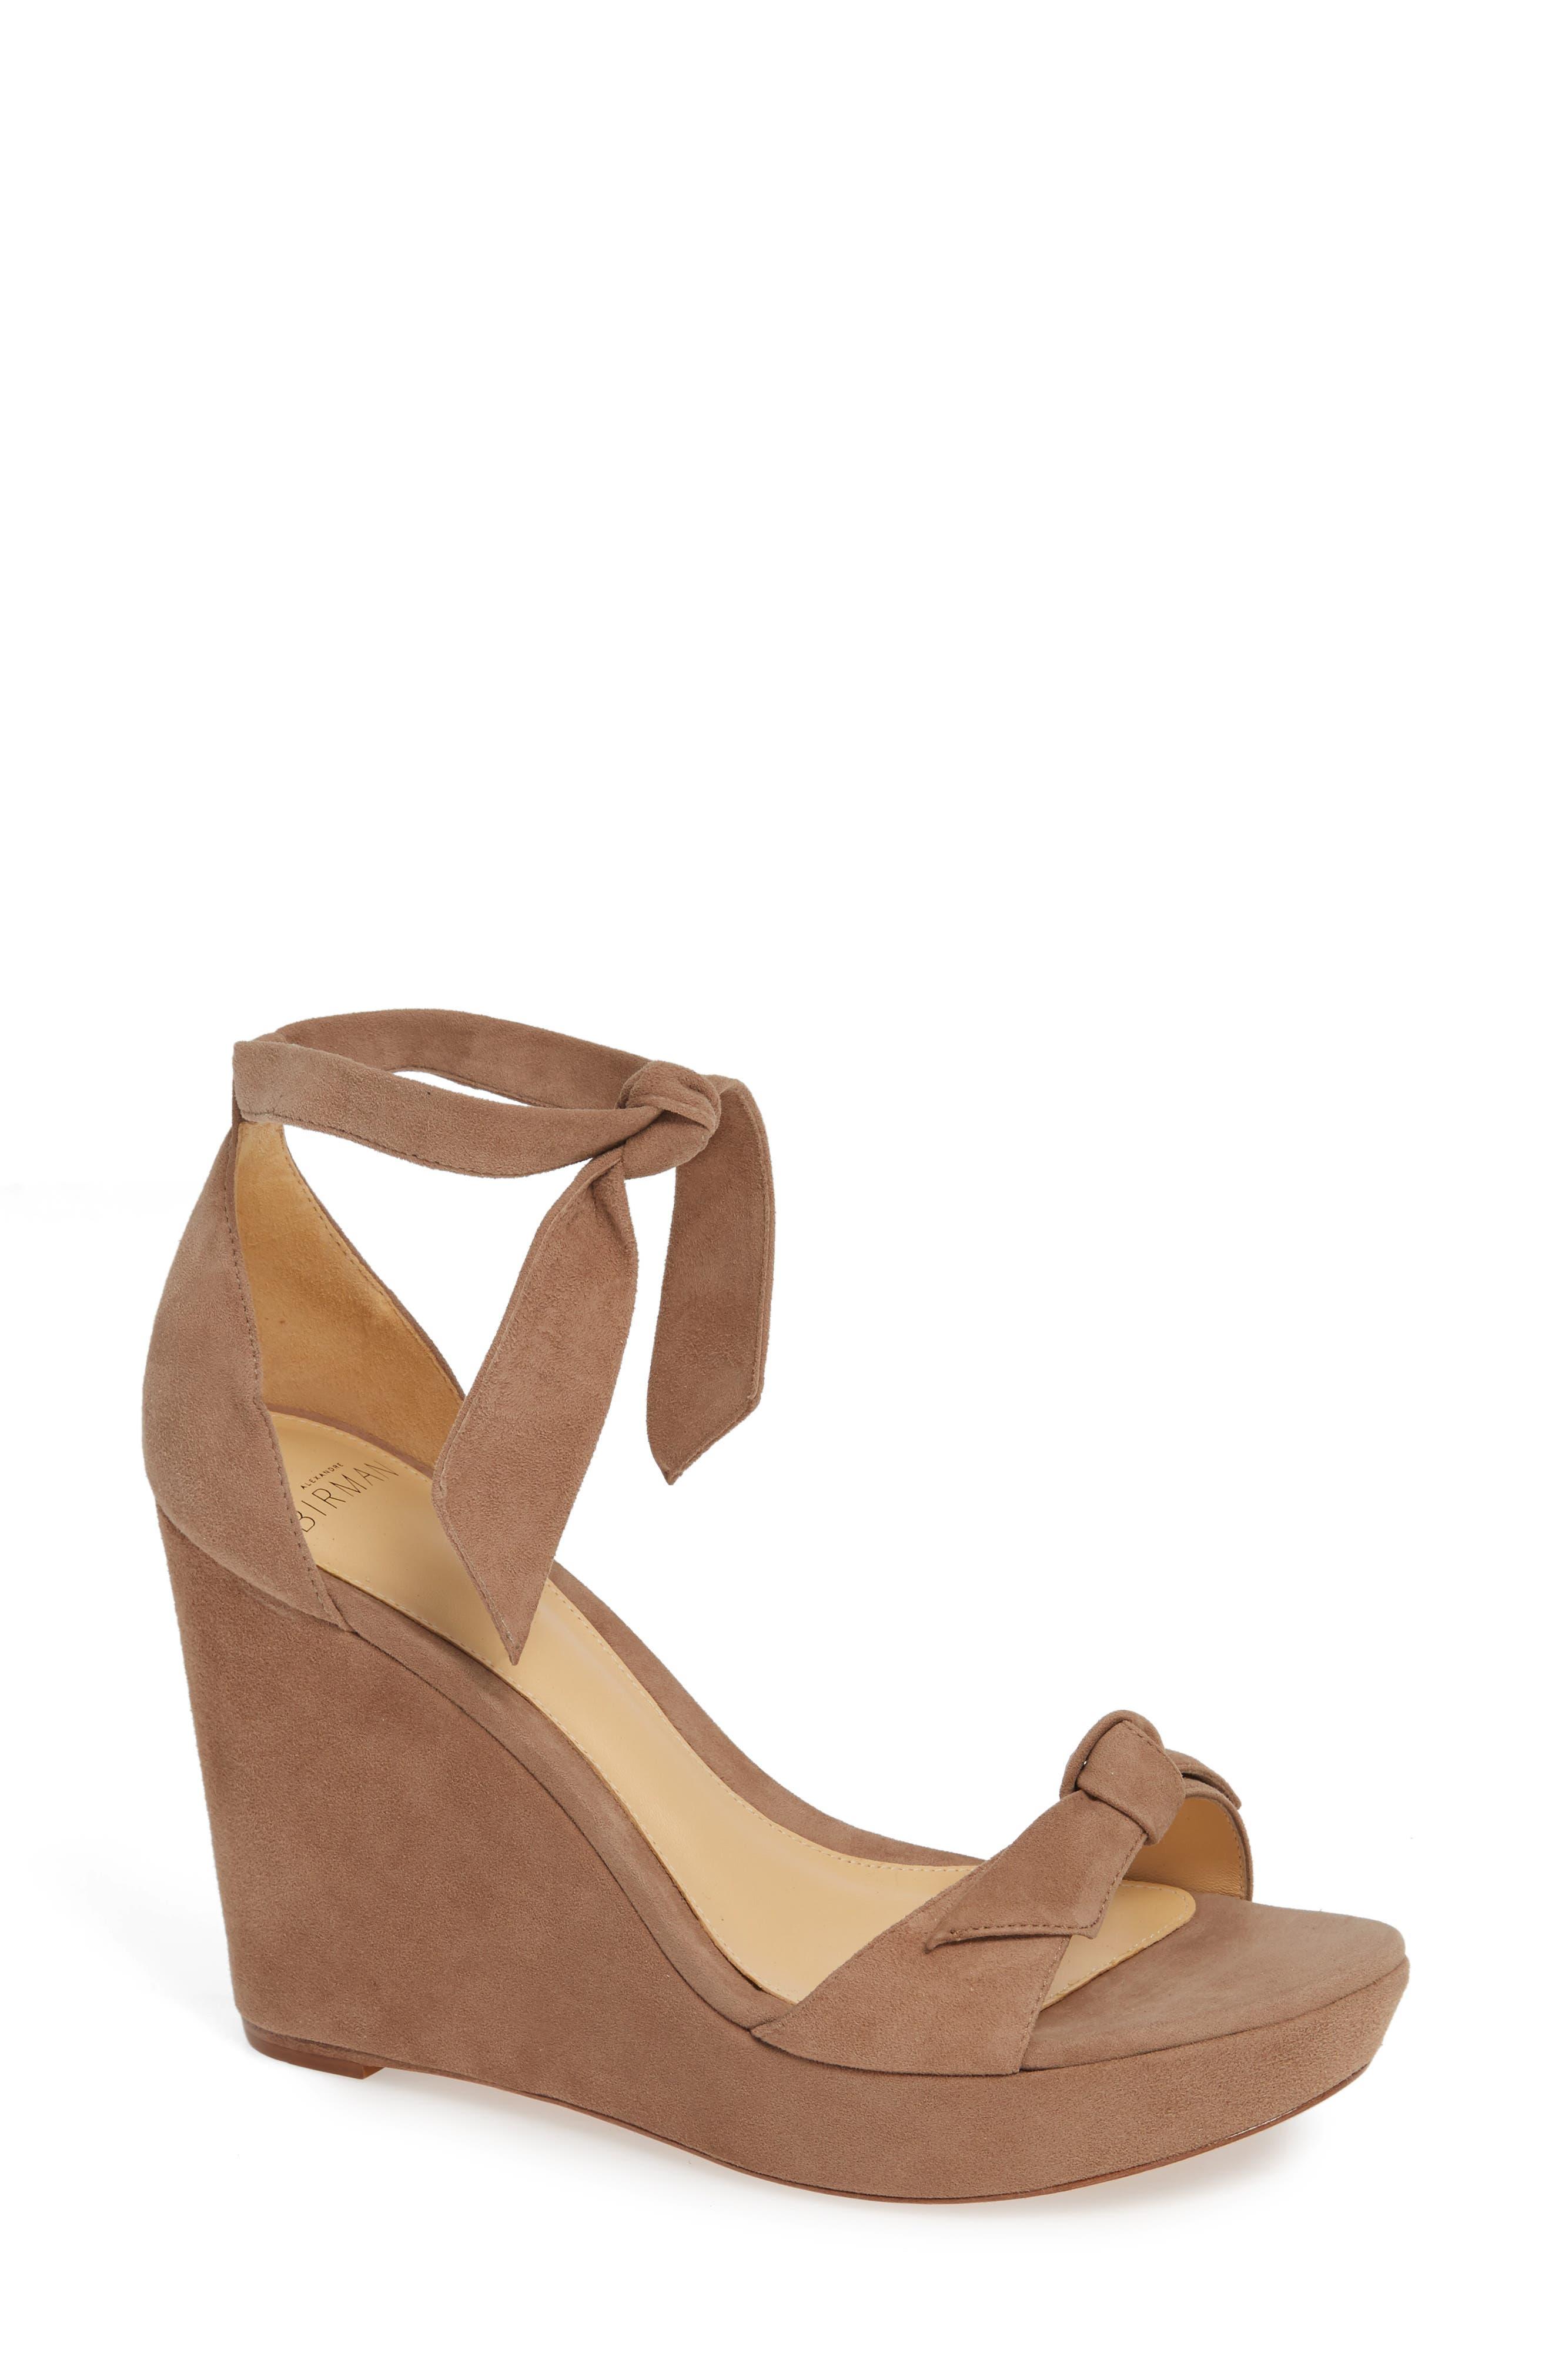 Alexandre Birman Clarita Platform Wedge Sandal, Beige